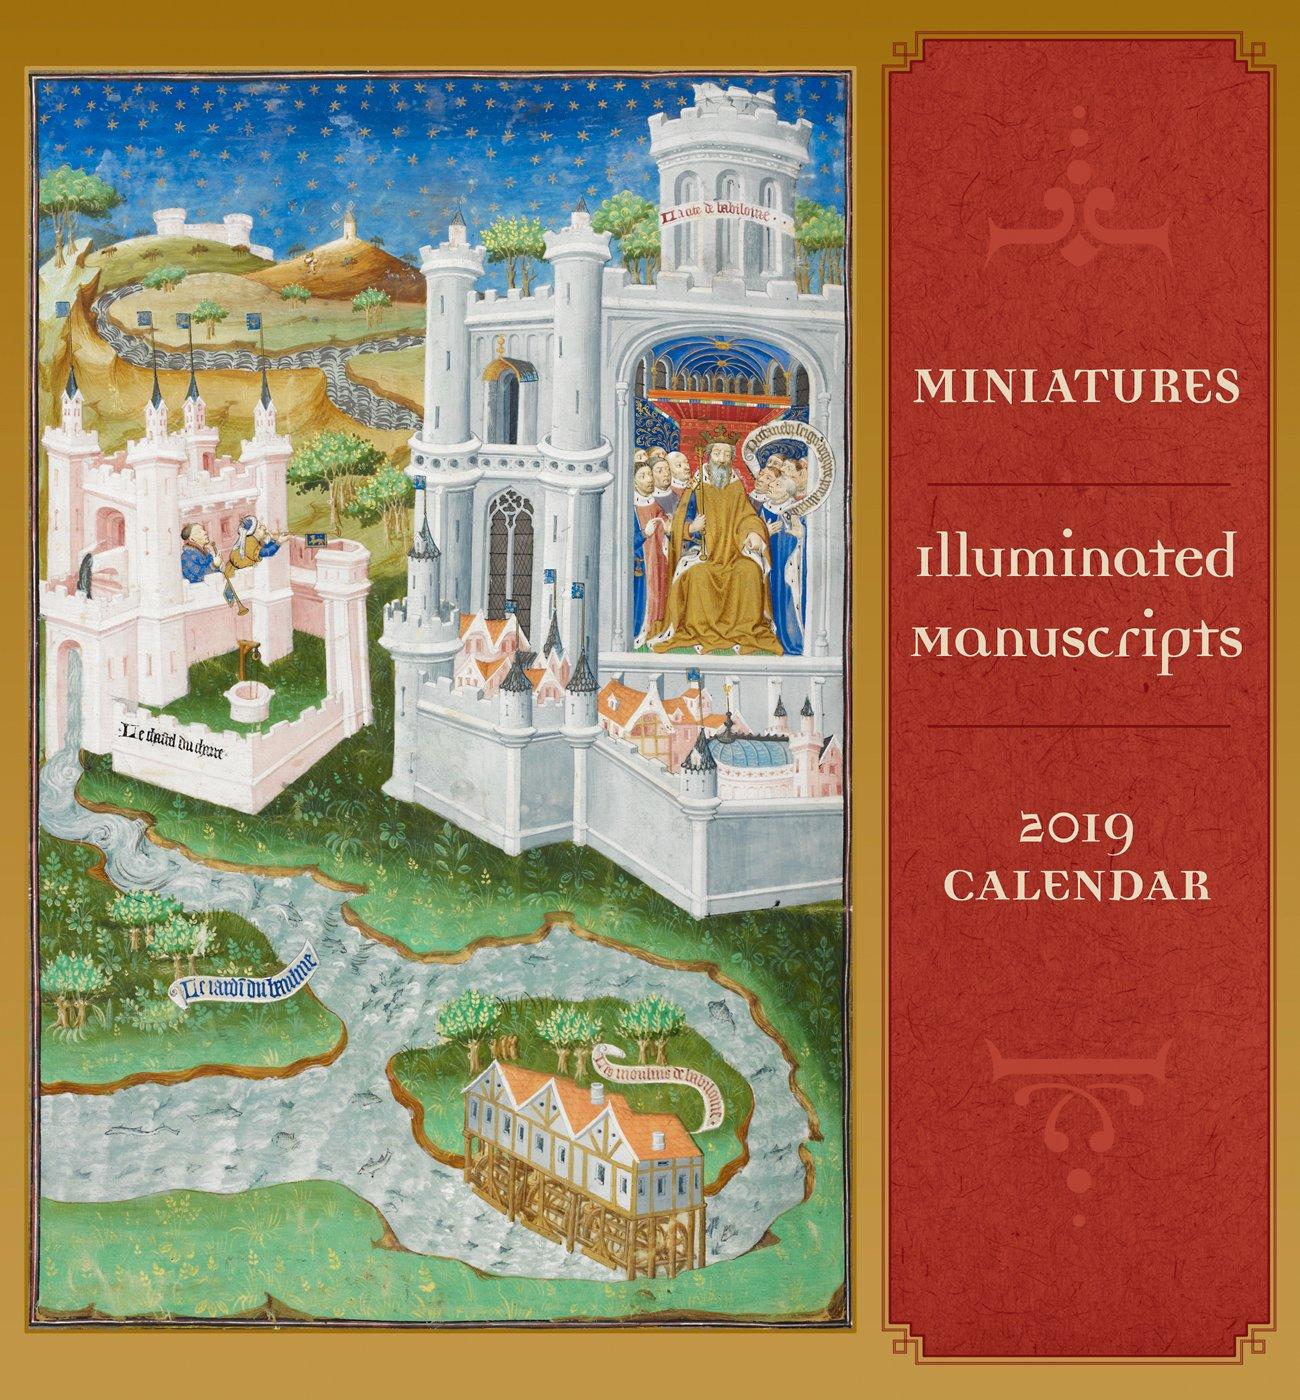 miniatures illuminated manuscripts 2019 mini wall calendar